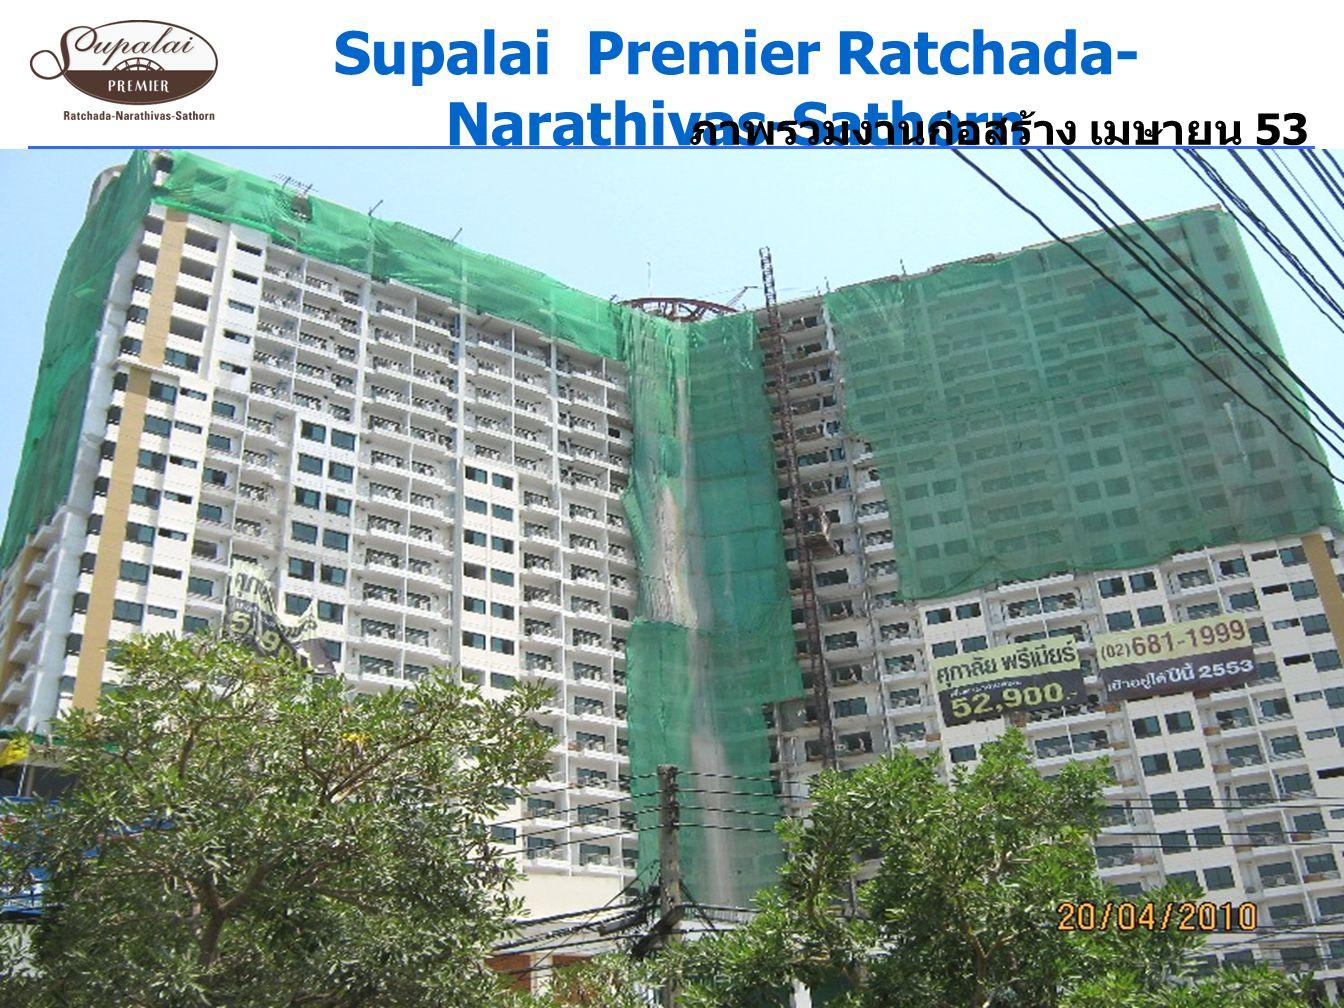 Supalai Premier Ratchada-Narathivas-Sathorn